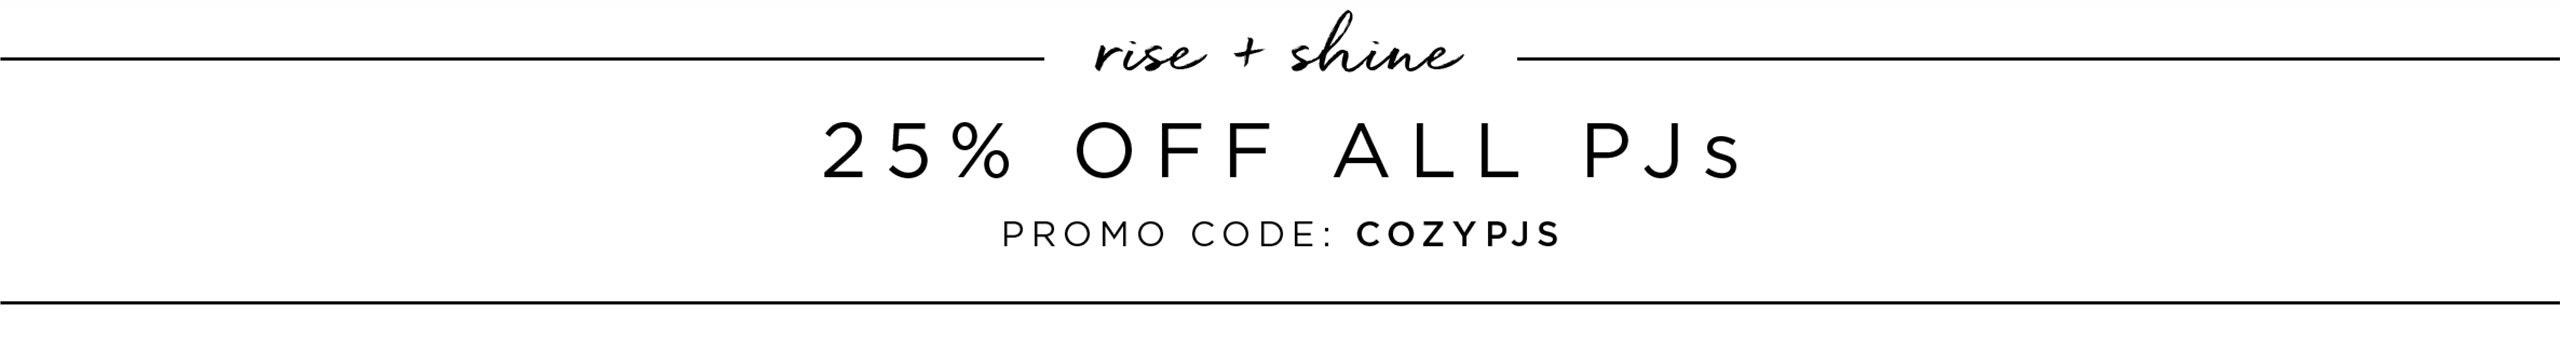 Rise + Shine - 25% off all PJs - Promo code: COZYPJS